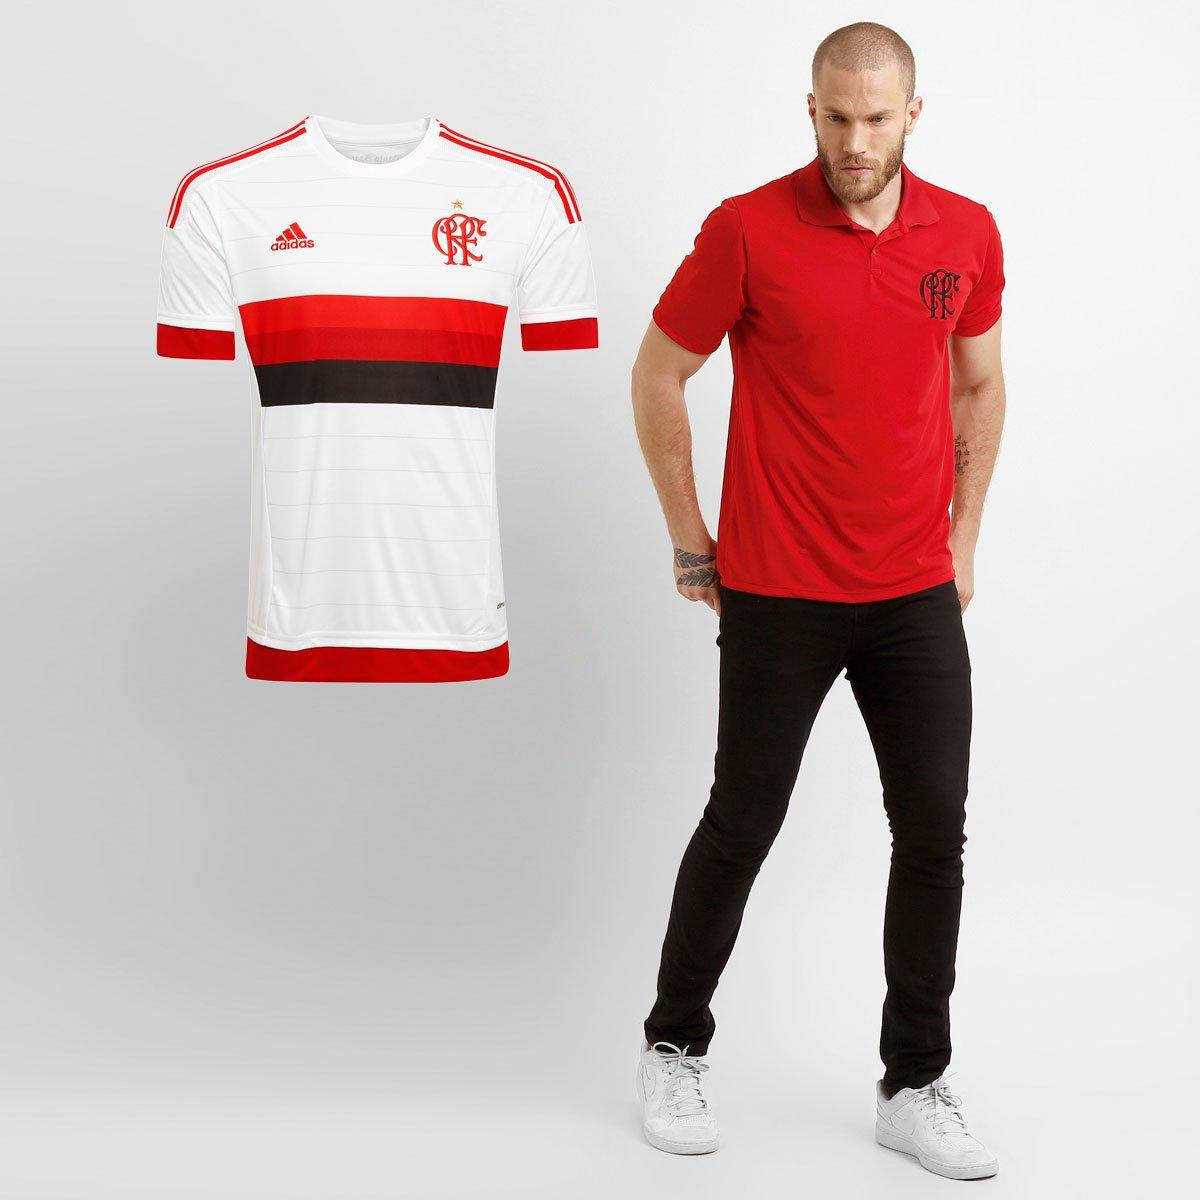 Kit Flamengo - Camisa Adidas Flamengo II 15 16 s nº + Camisa Polo - Compre  Agora  ca0e056e0ed51